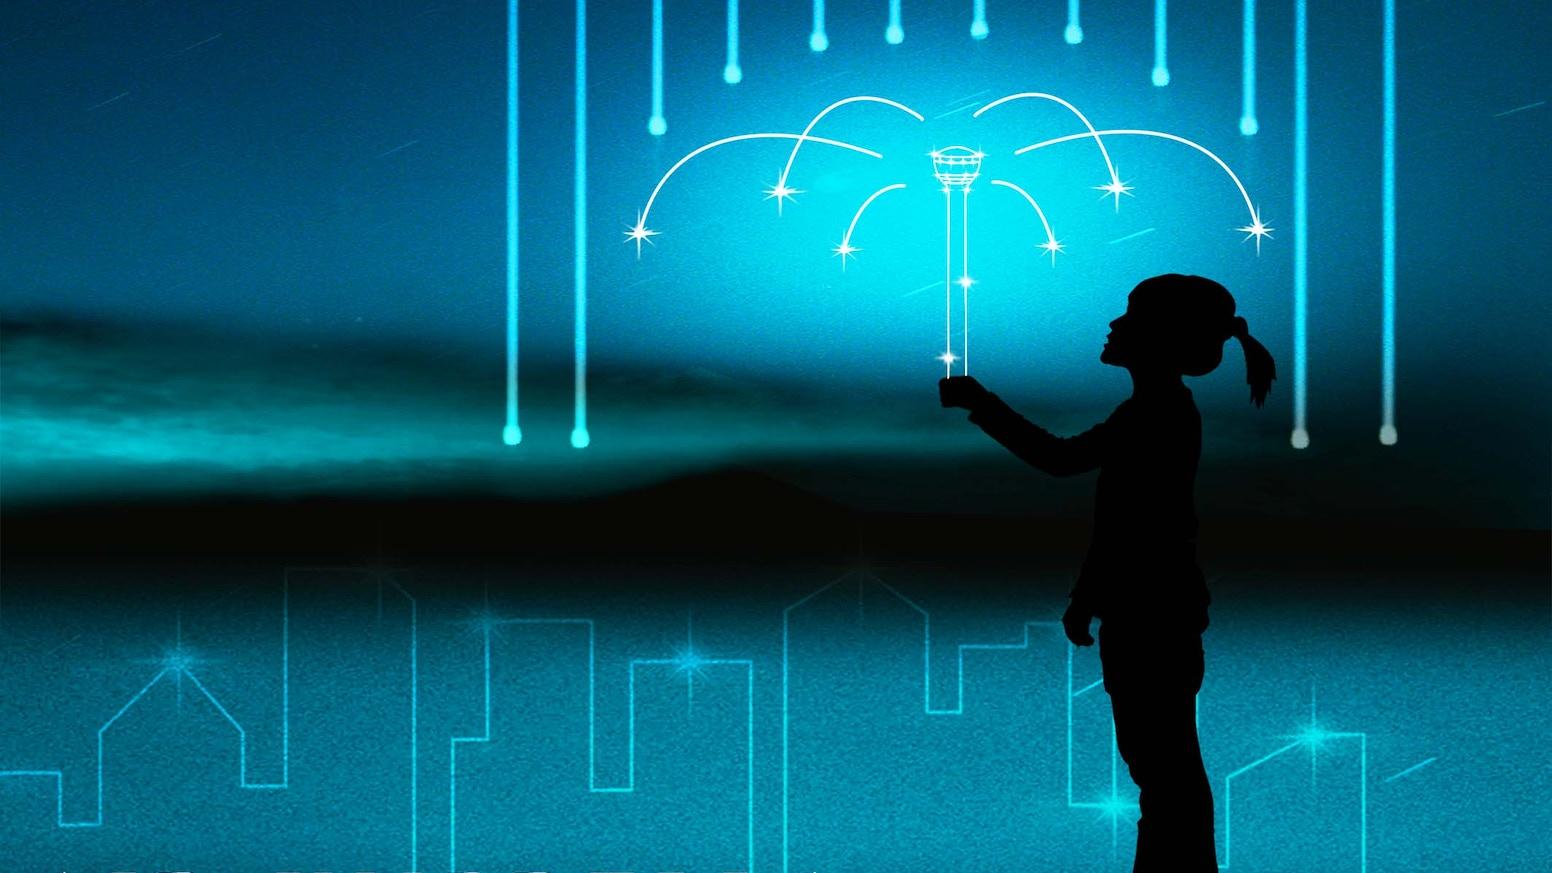 air umbrella by air umbrella kickstarter